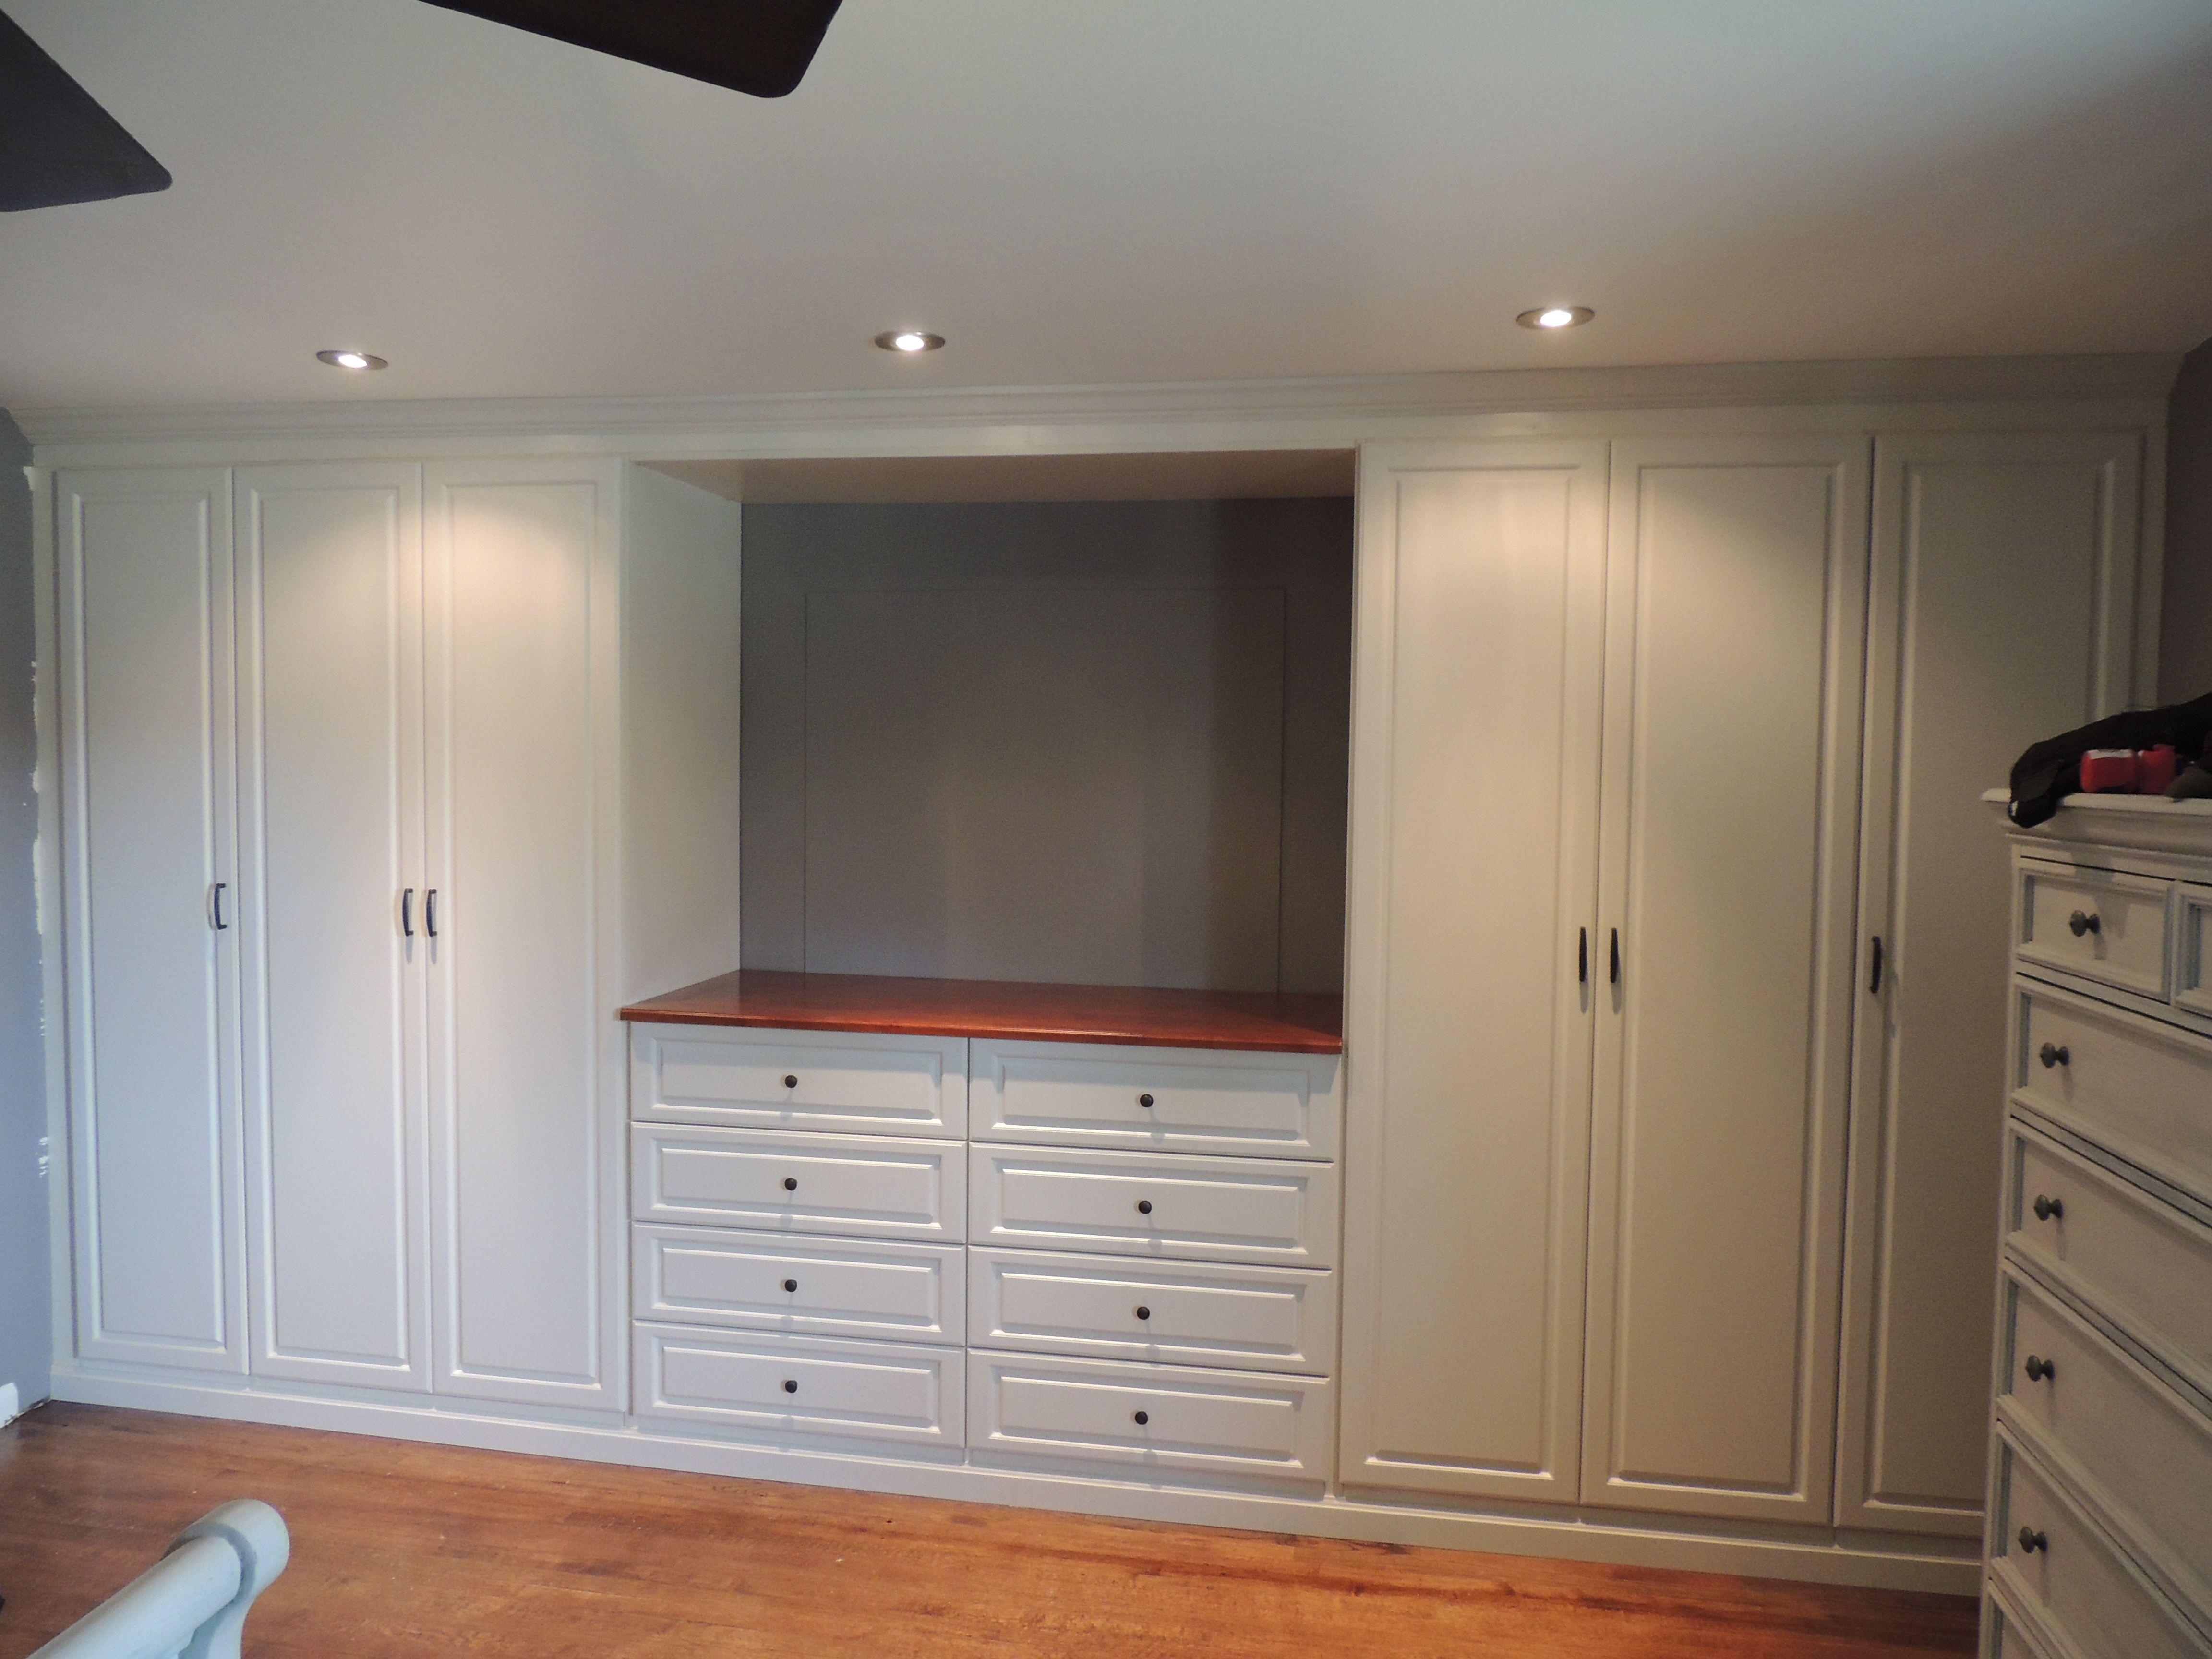 Custom White Wall Unit In A Master Bedroom Wardrobes Bedroom Bedroom Wall Units Build A Closet Bedroom Built Ins